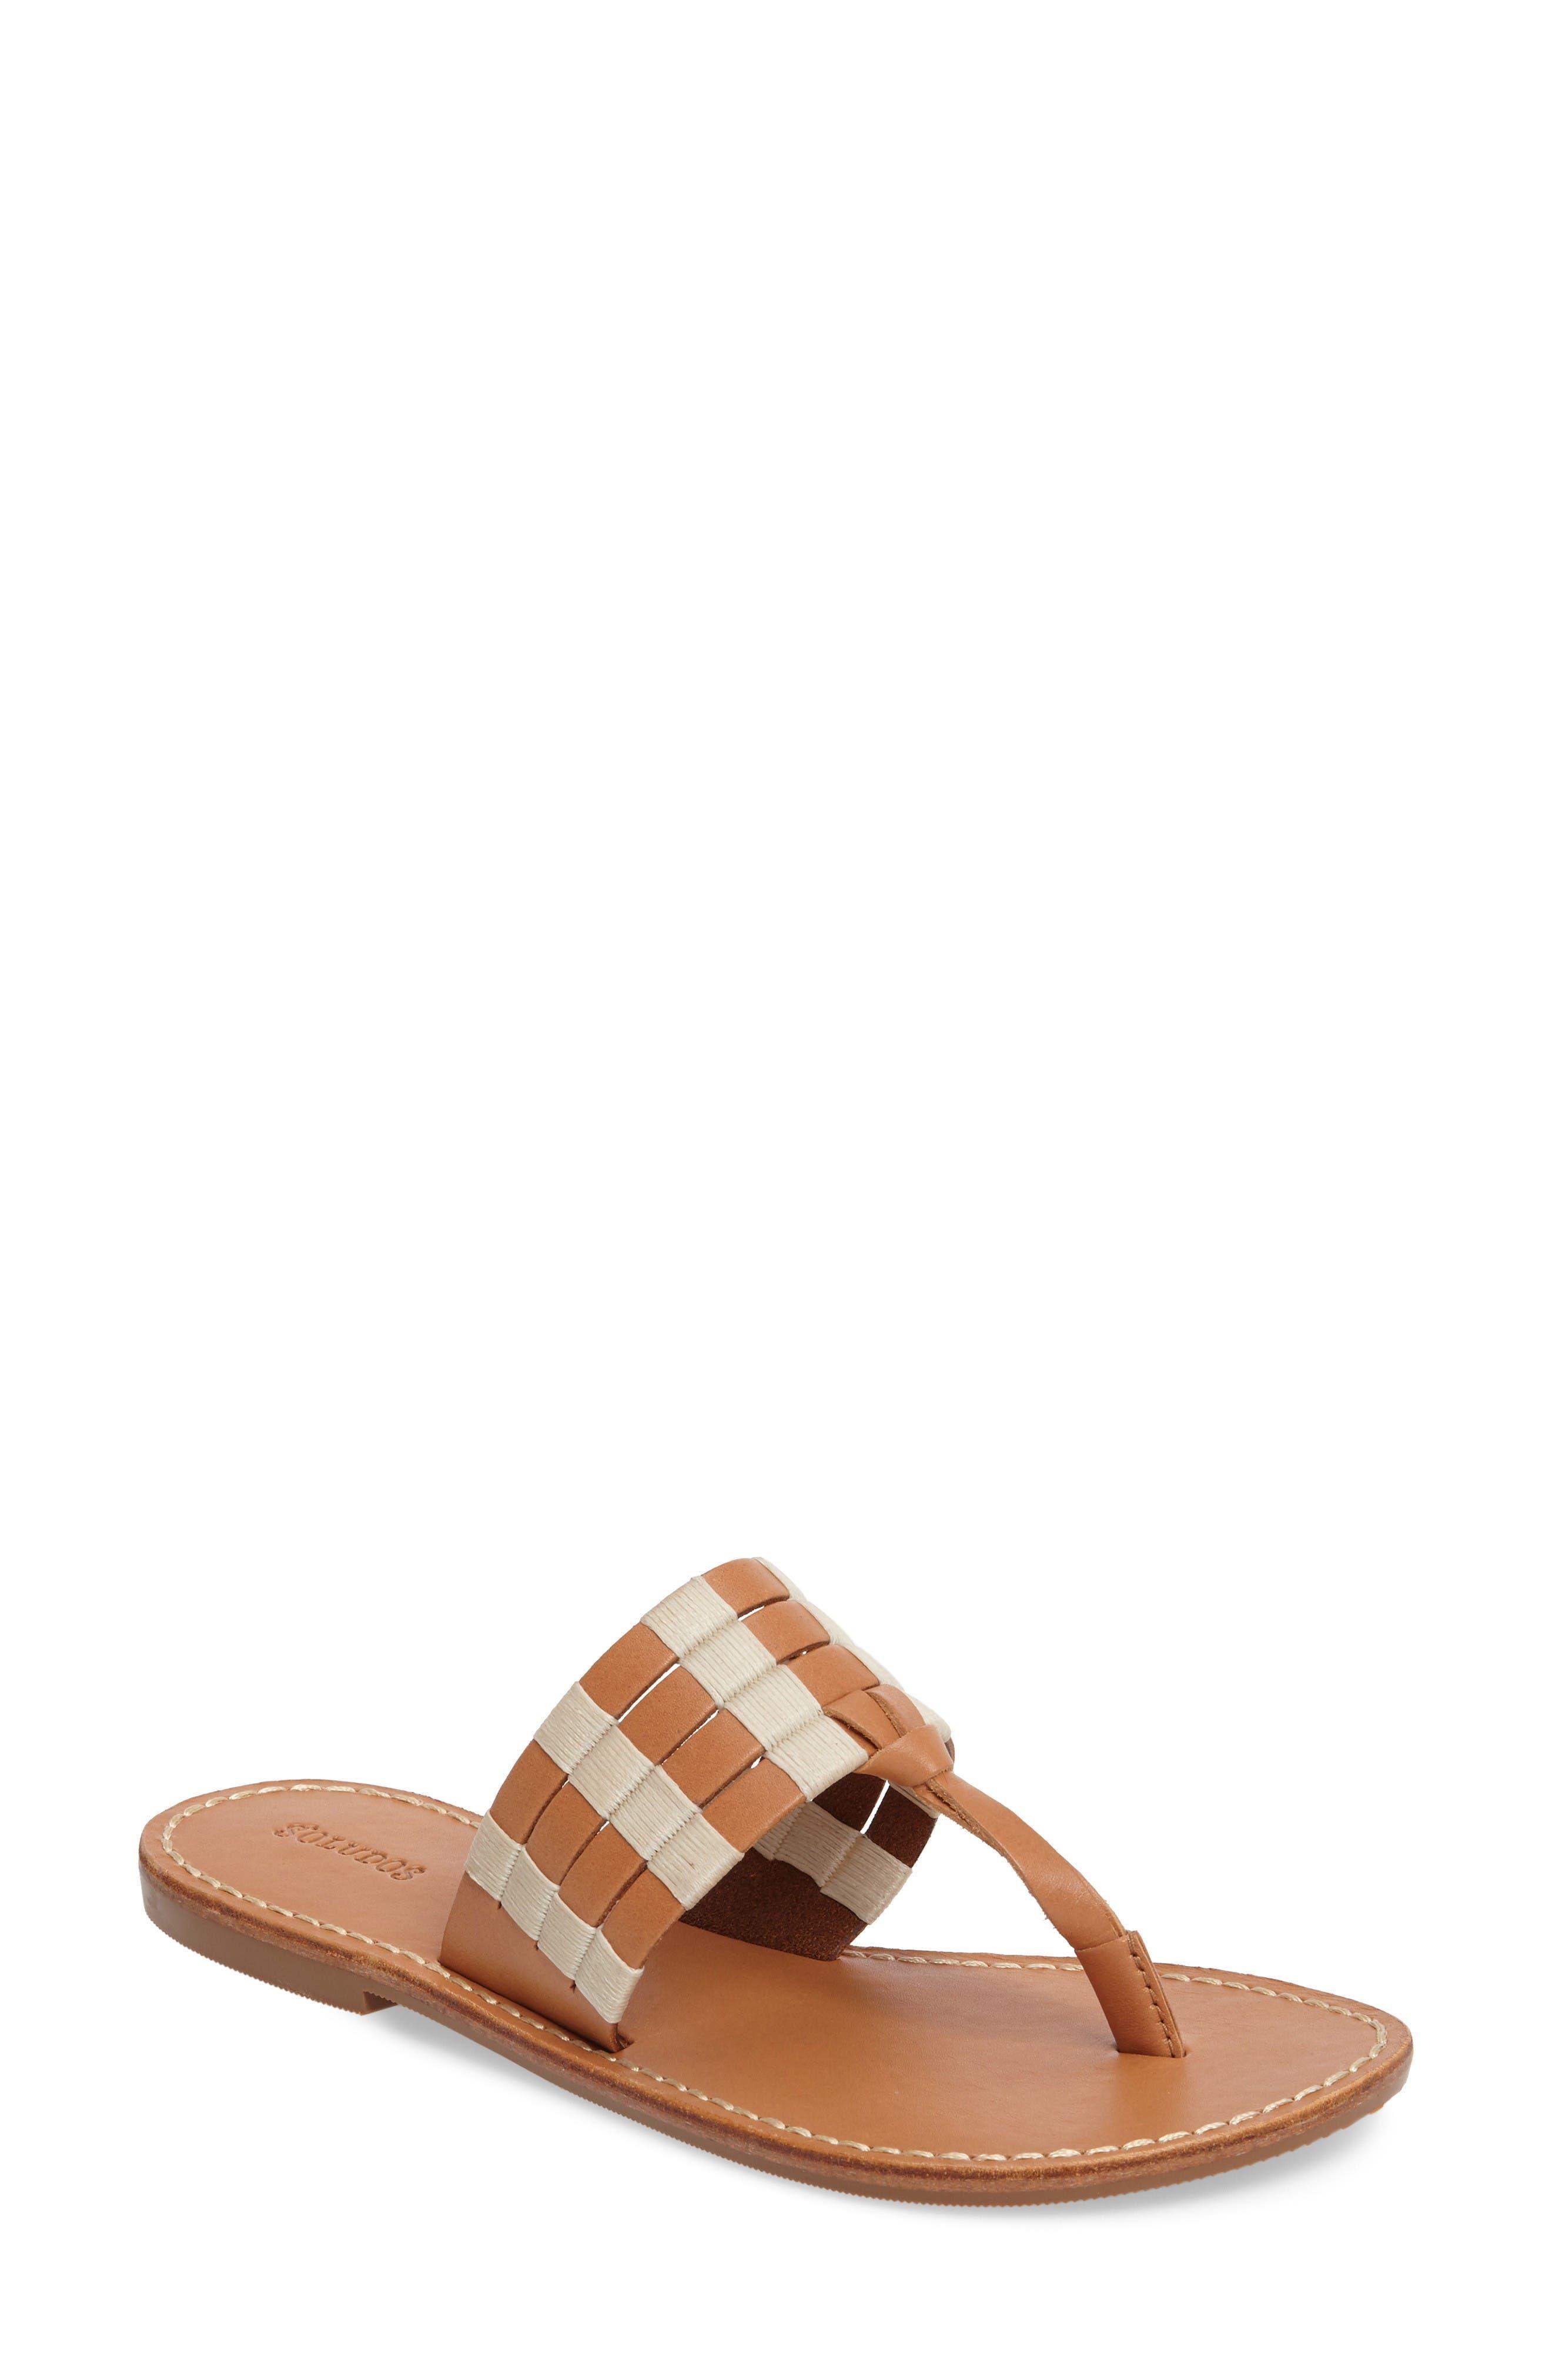 Alternate Image 1 Selected - Soludos Sandal (Women)